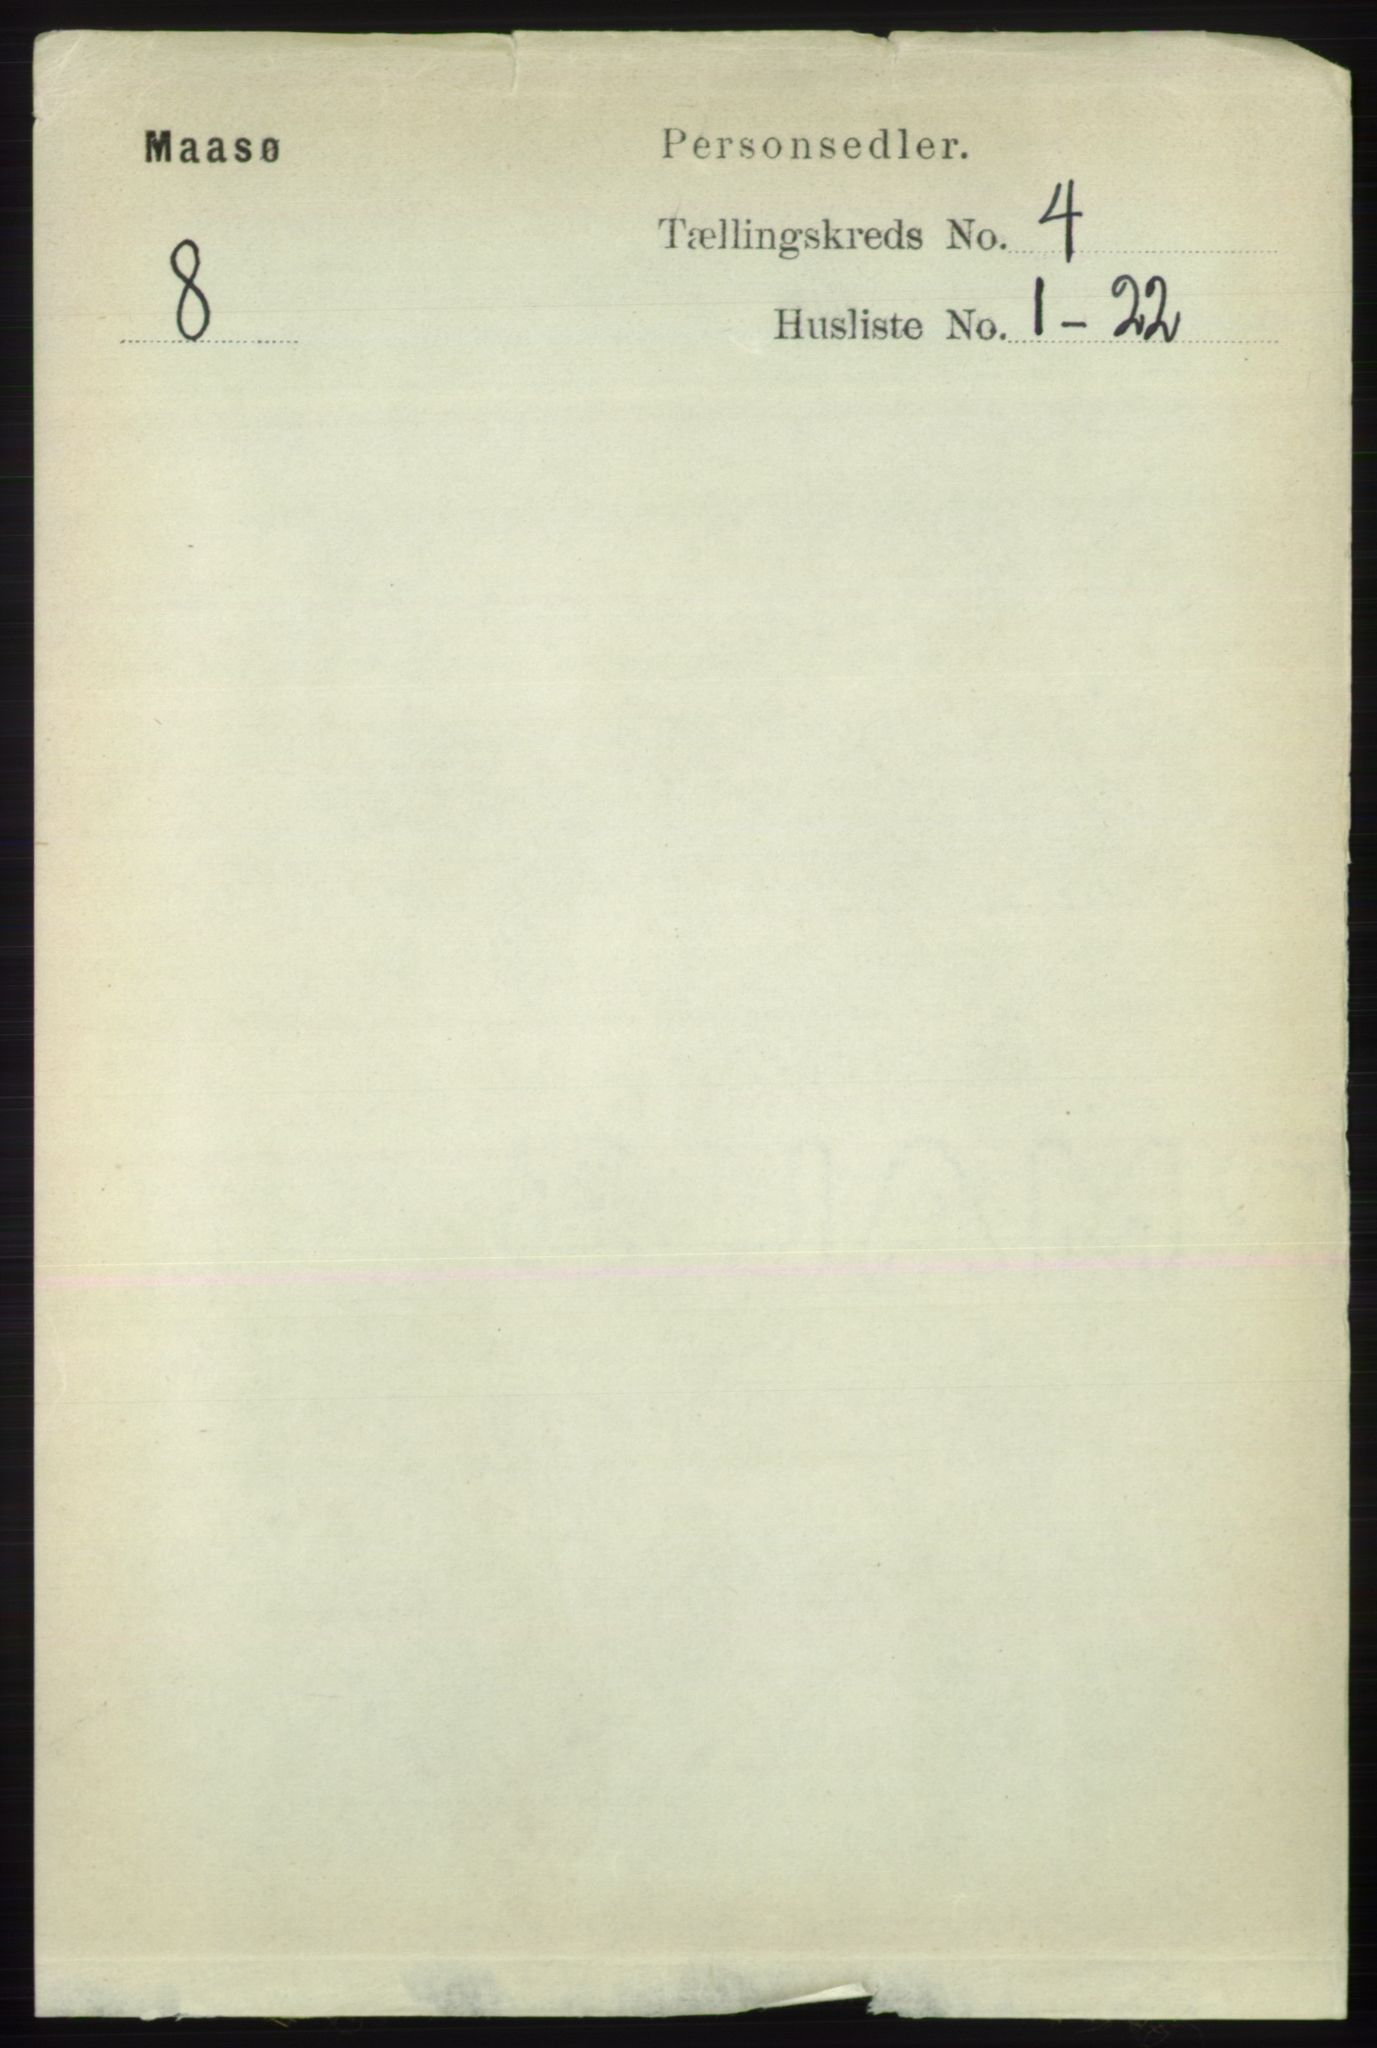 RA, Folketelling 1891 for 2018 Måsøy herred, 1891, s. 529